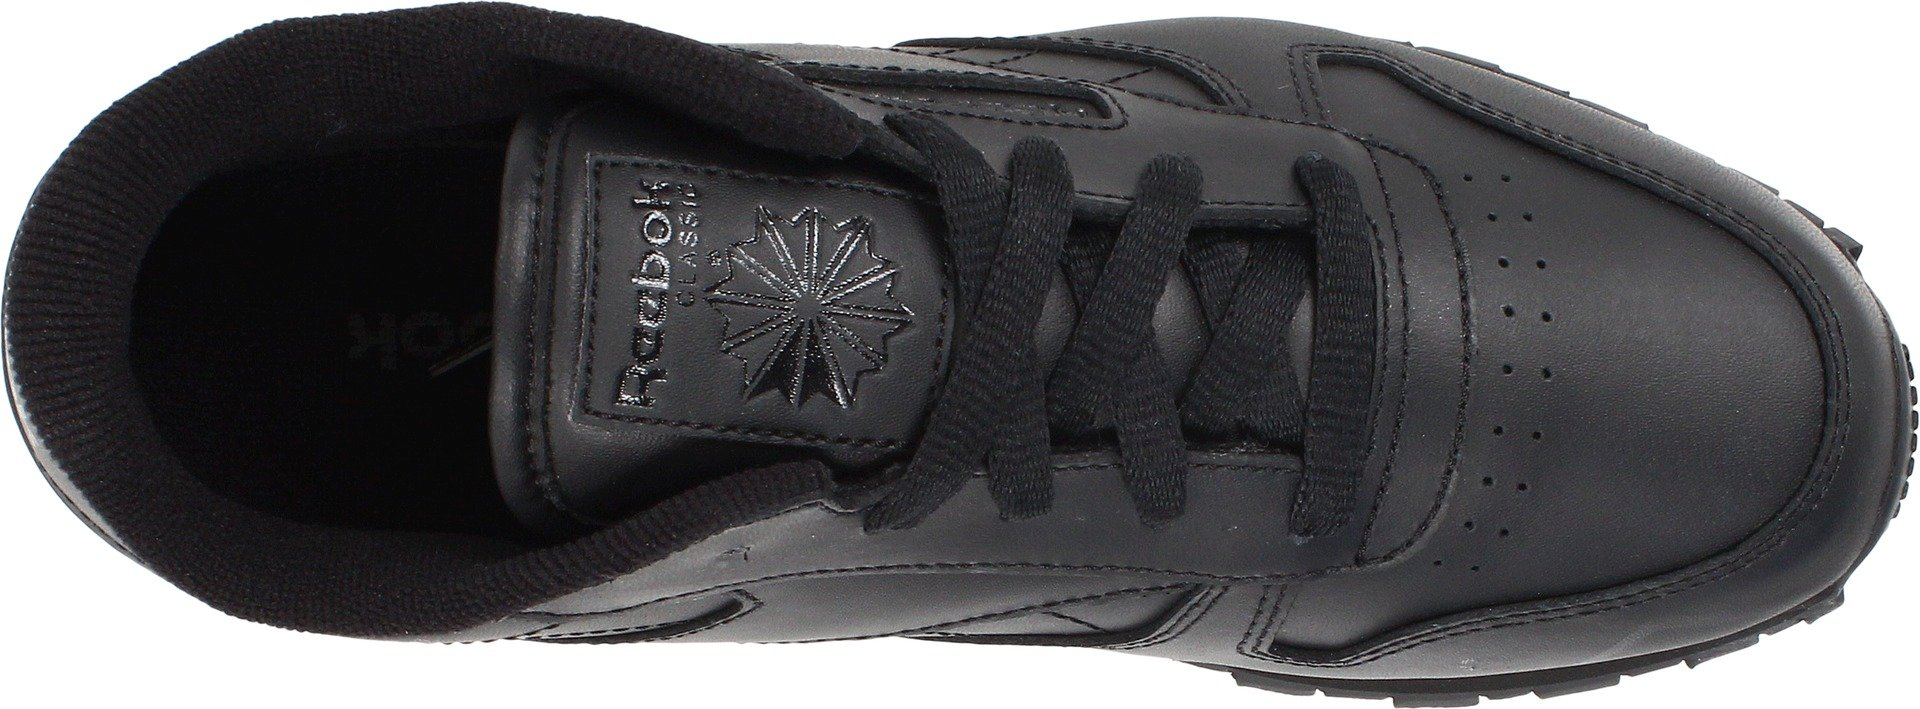 Reebok Classic Leather Shoe,Black/Black/Black,11.5 M US Little Kid by Reebok (Image #7)